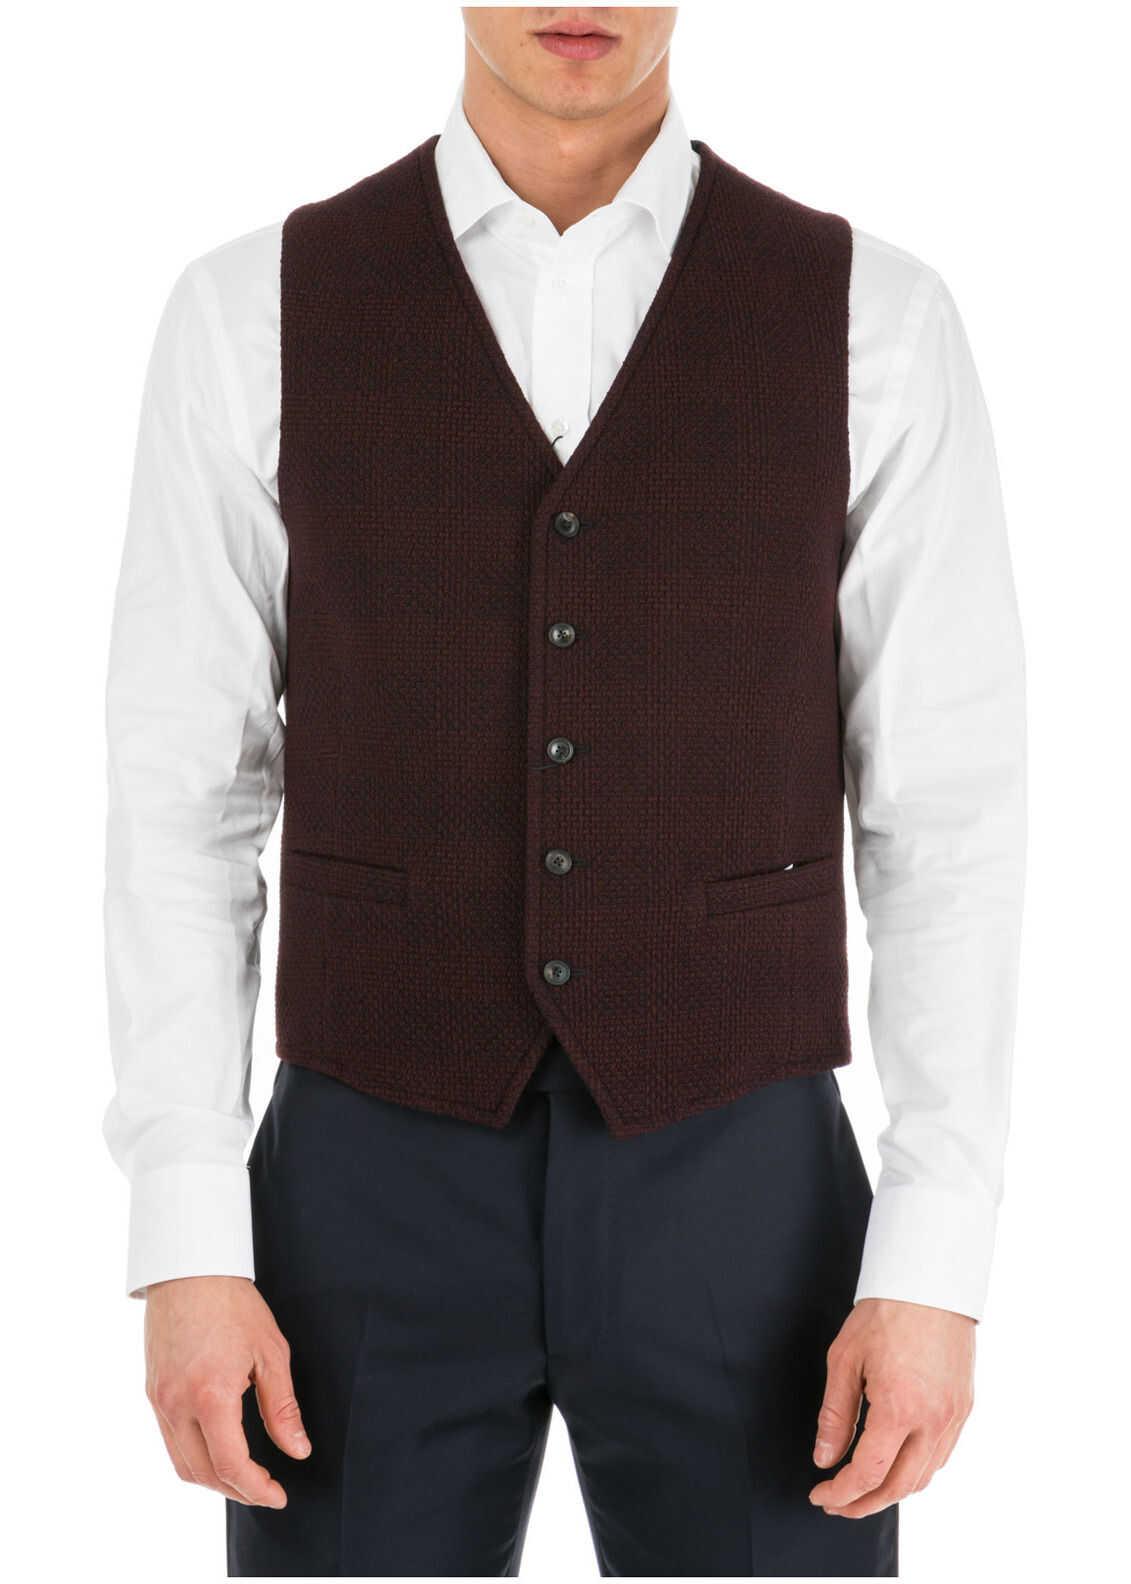 Emporio Armani Waistcoat Vest Red